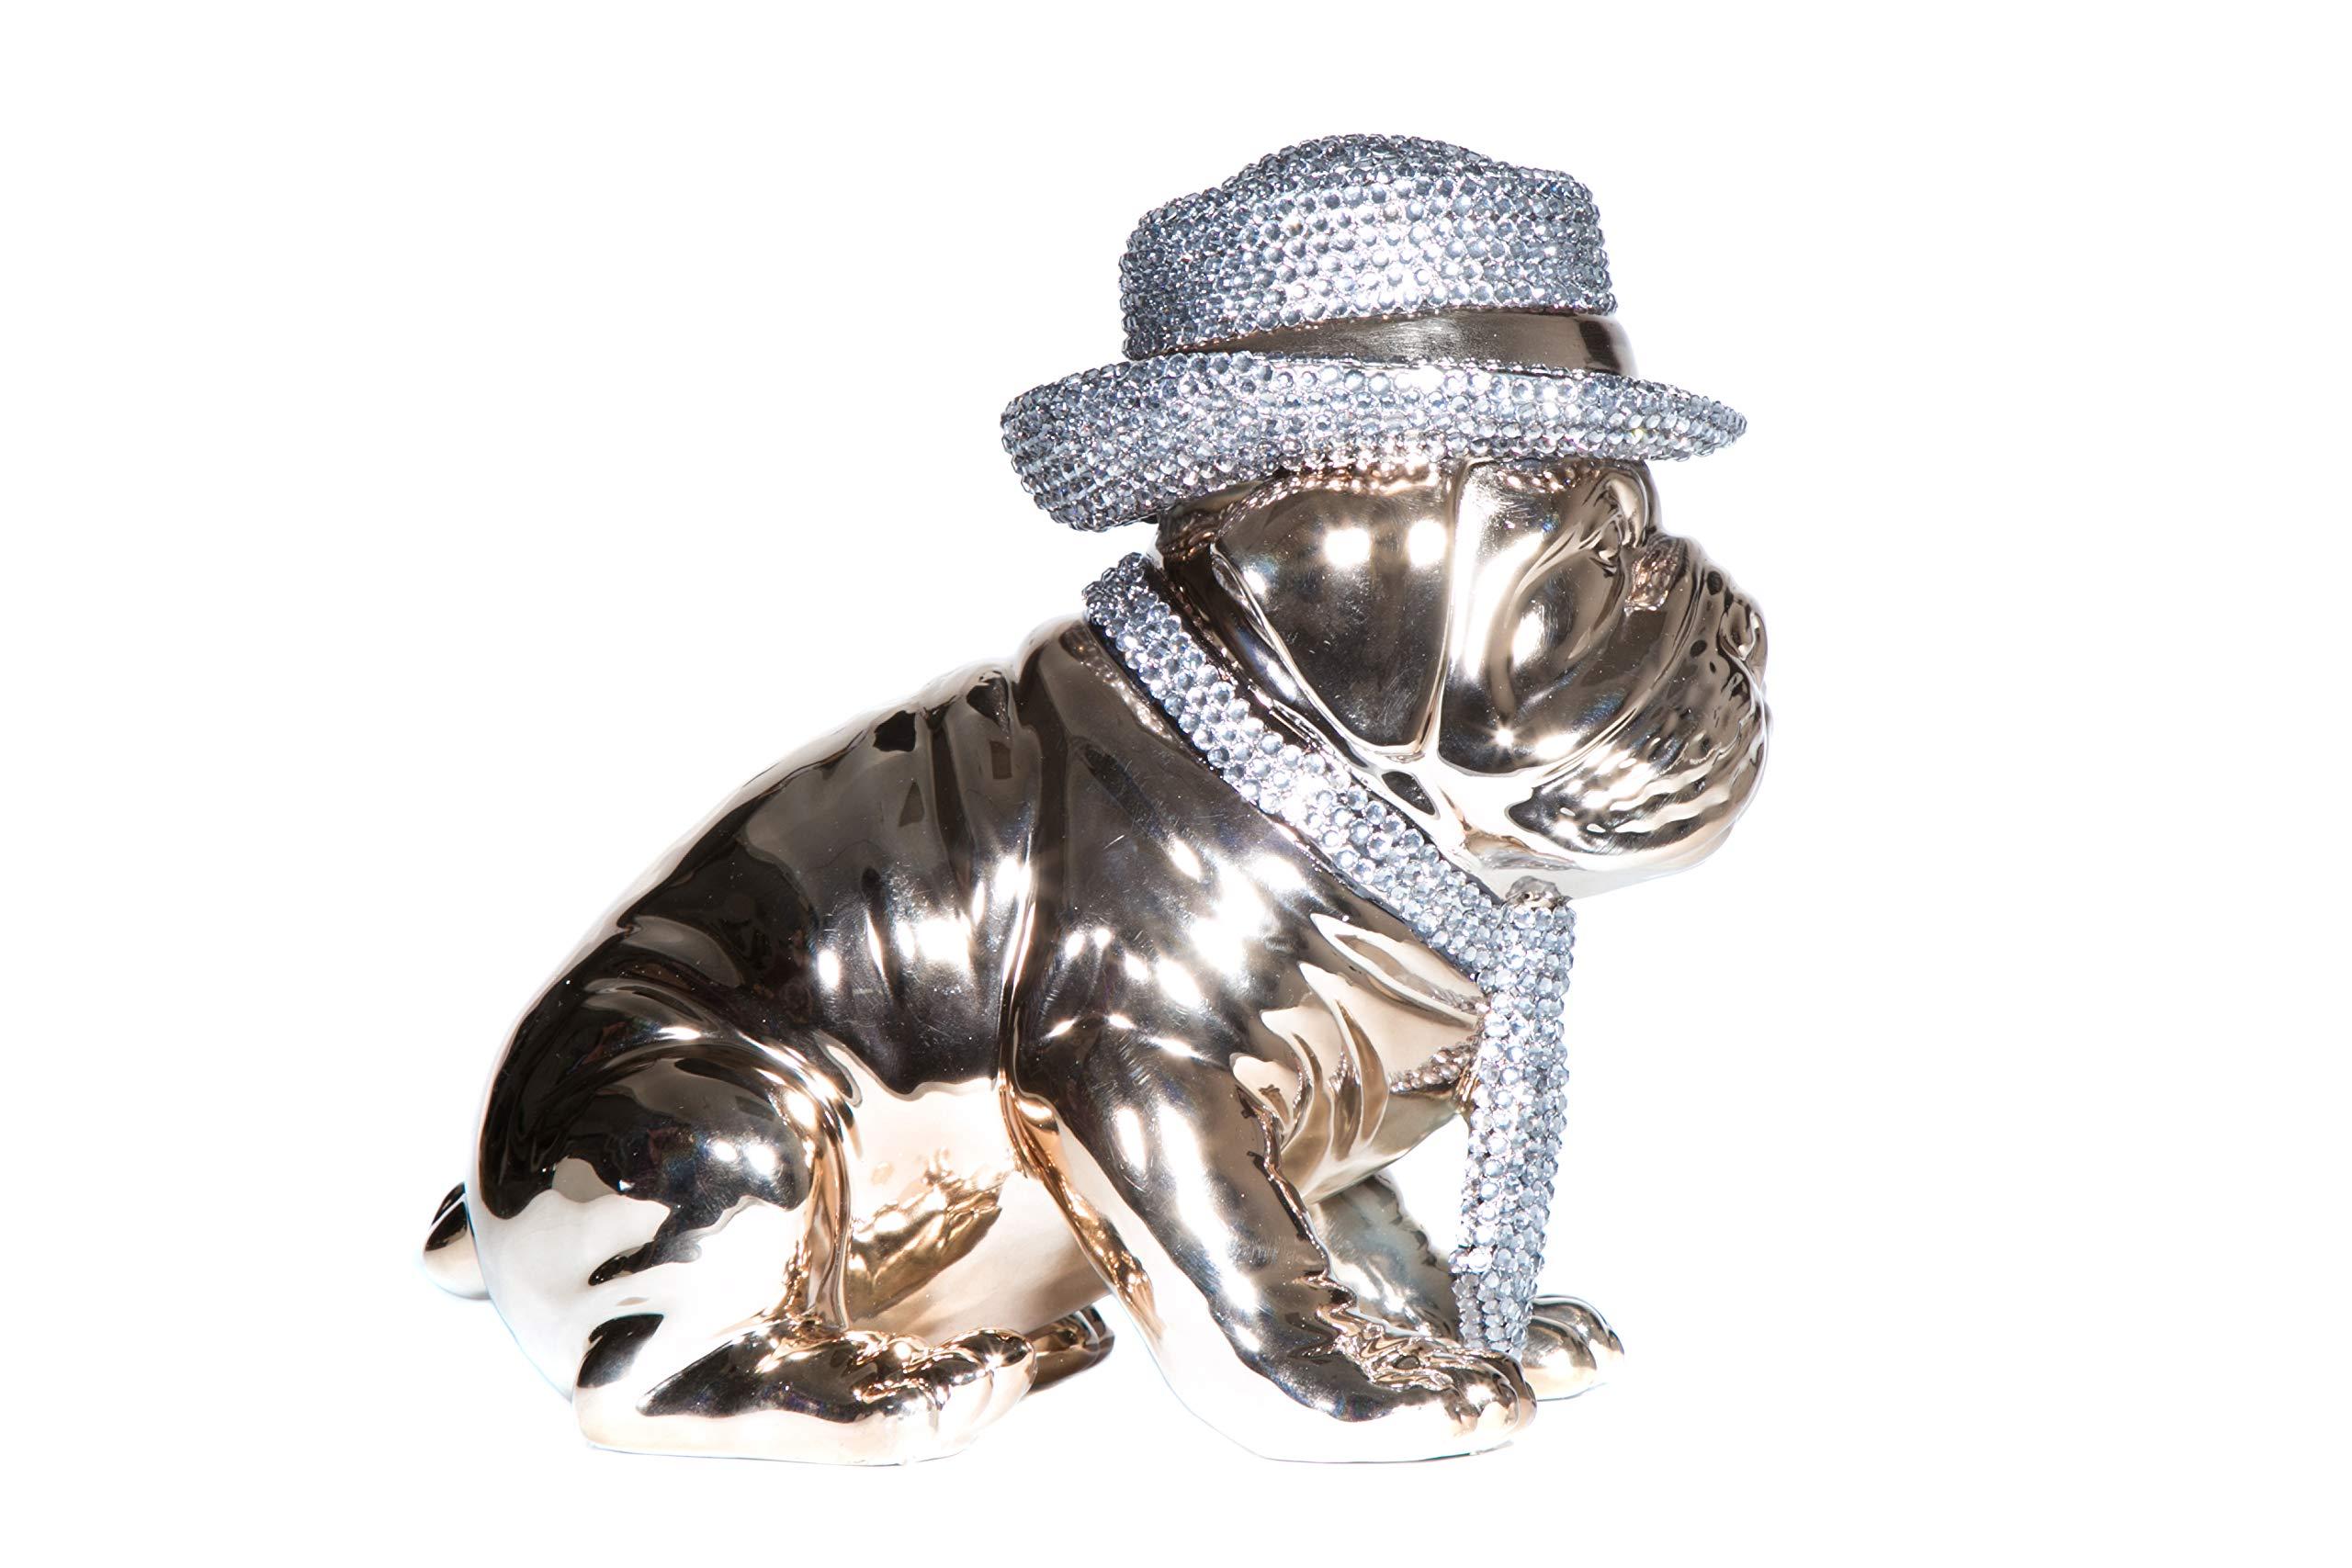 Interior Illusions Plus ii000345 Doggy Bank Rhinestone Hat, White by Interior Illusions Plus (Image #2)